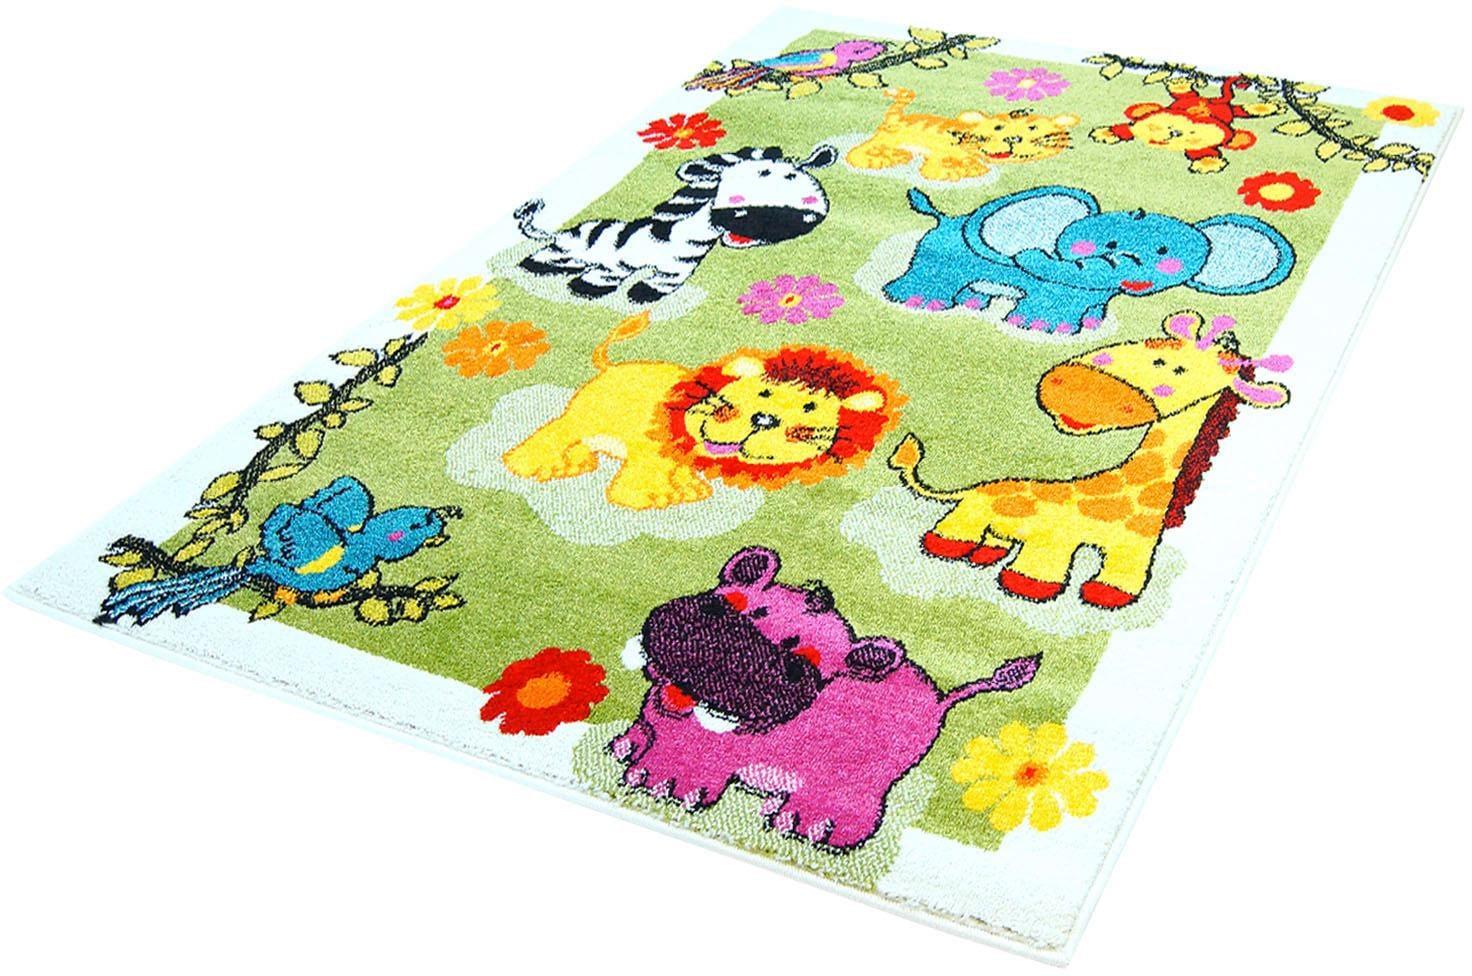 Kinderteppich Moda Kids 5508 Carpet City rechteckig Höhe 11 mm maschinell zusammengesetzt